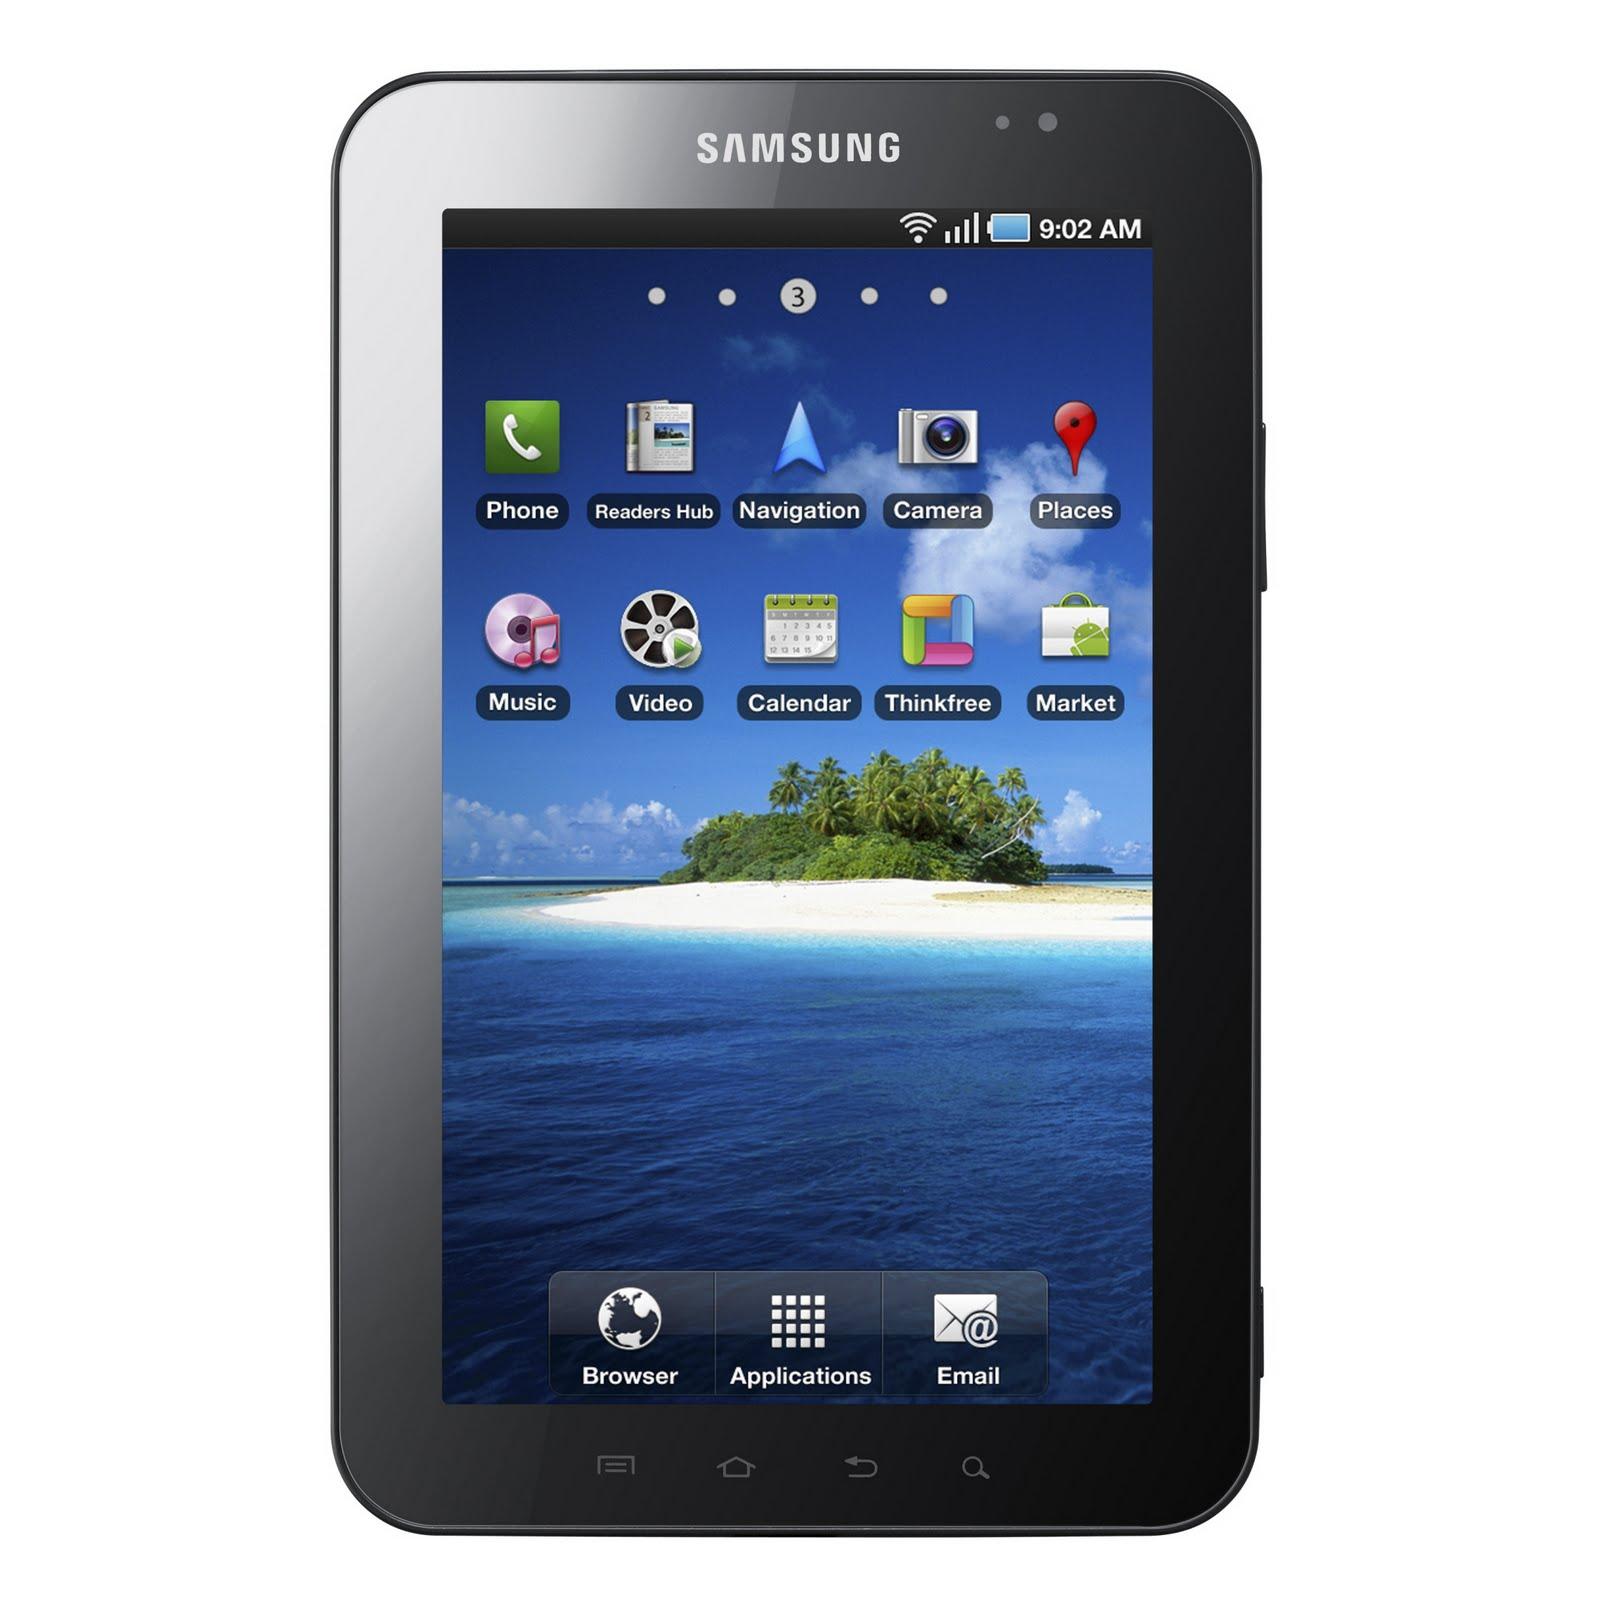 http://1.bp.blogspot.com/_PyzGklHH3A4/TLyvyp9AMRI/AAAAAAAAAtI/lZKJreou81I/s1600/Samsung_GalaxyTAB_P1000_produkt_0Ordinateur_portable.jpg